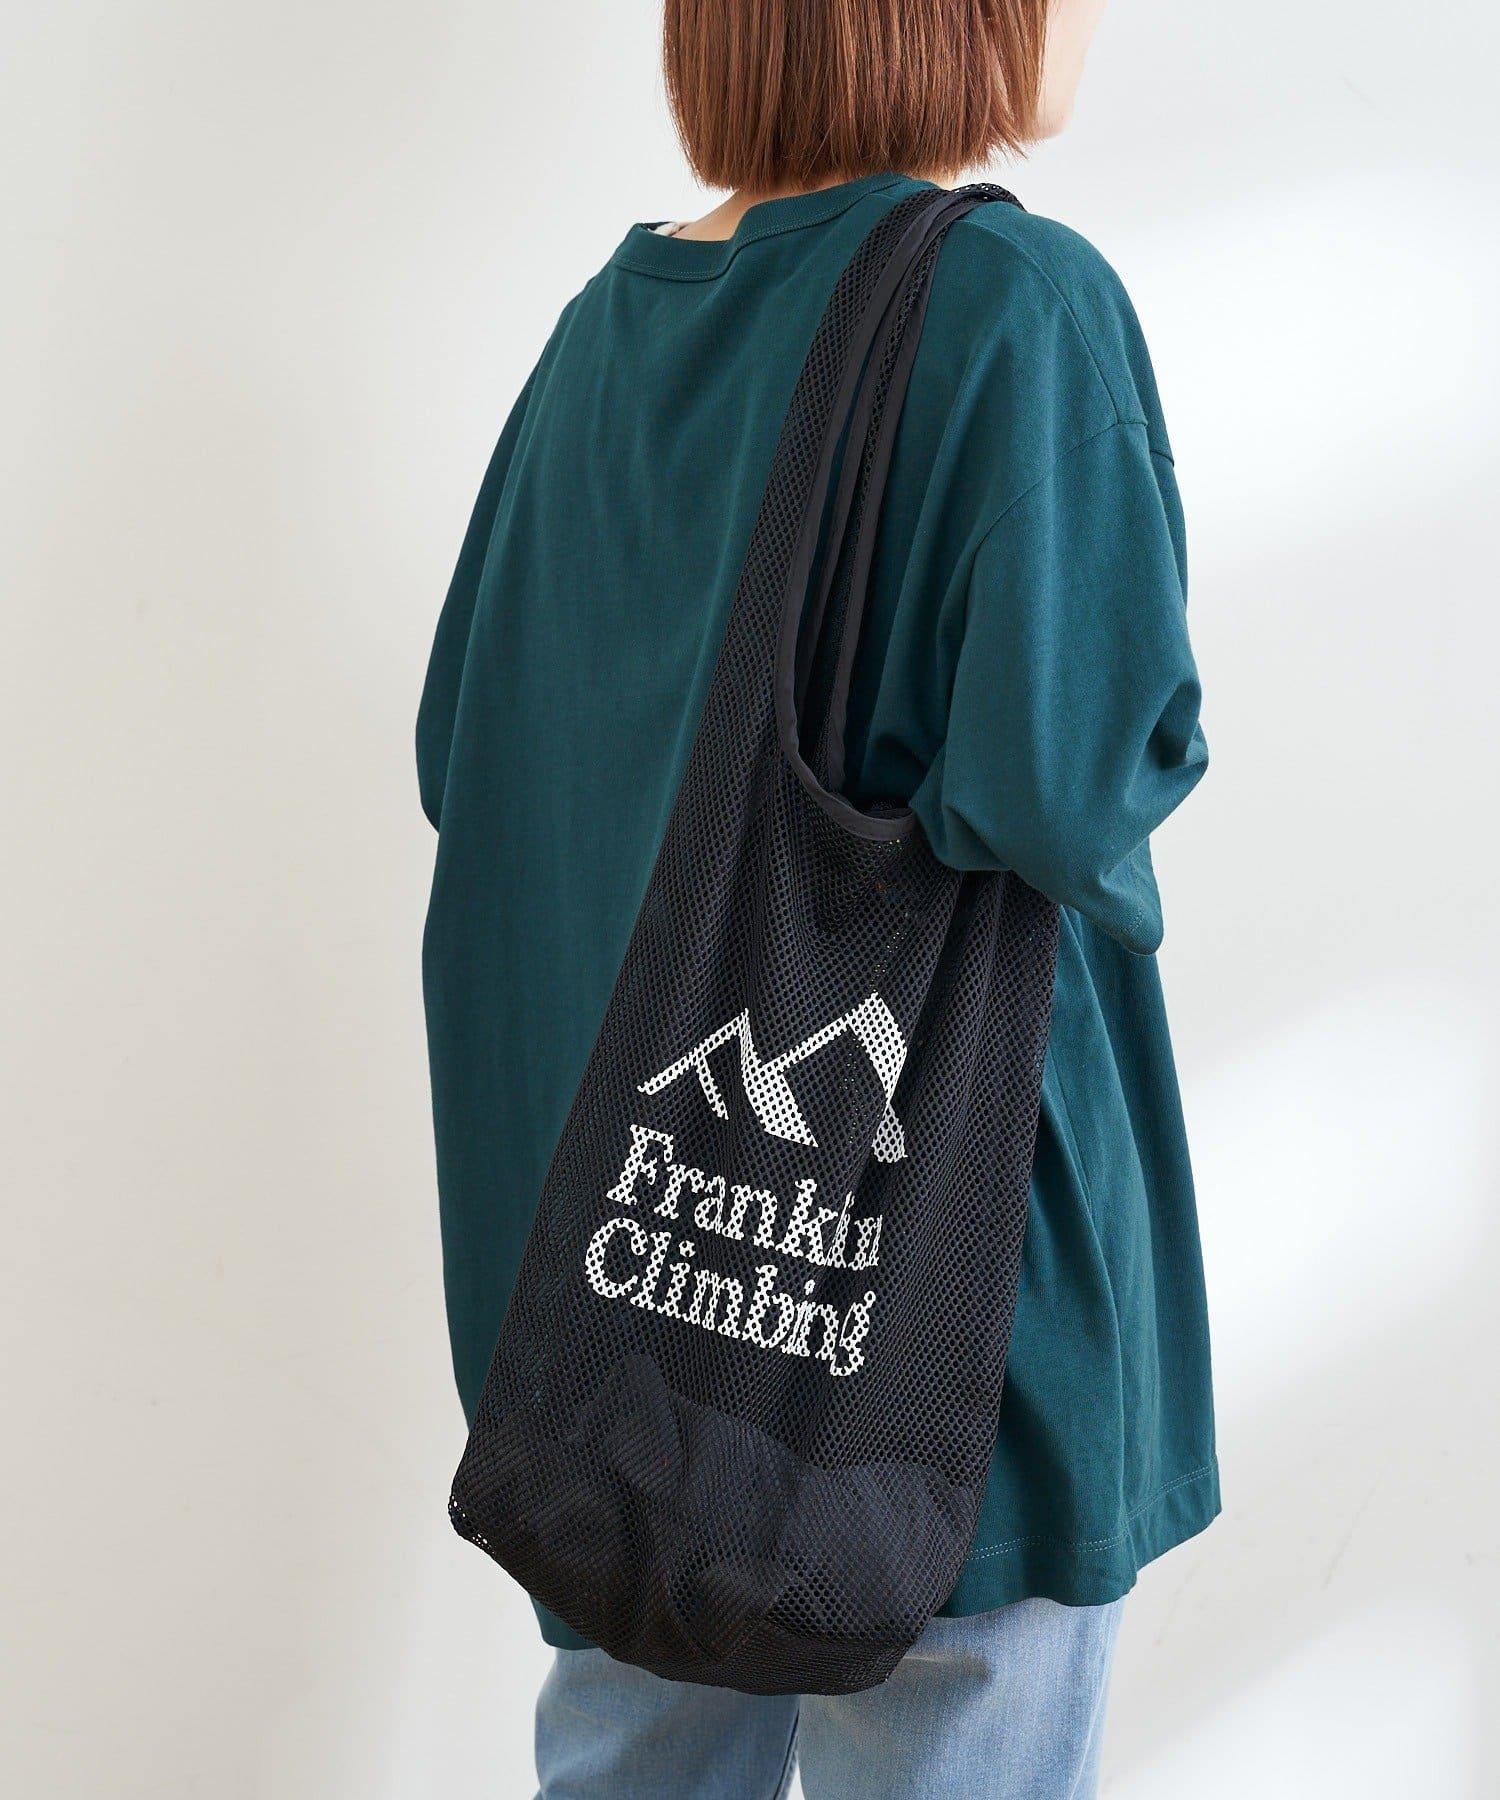 CIAOPANIC TYPY(チャオパニックティピー) 【Franklin Climbing】メッシュBAG